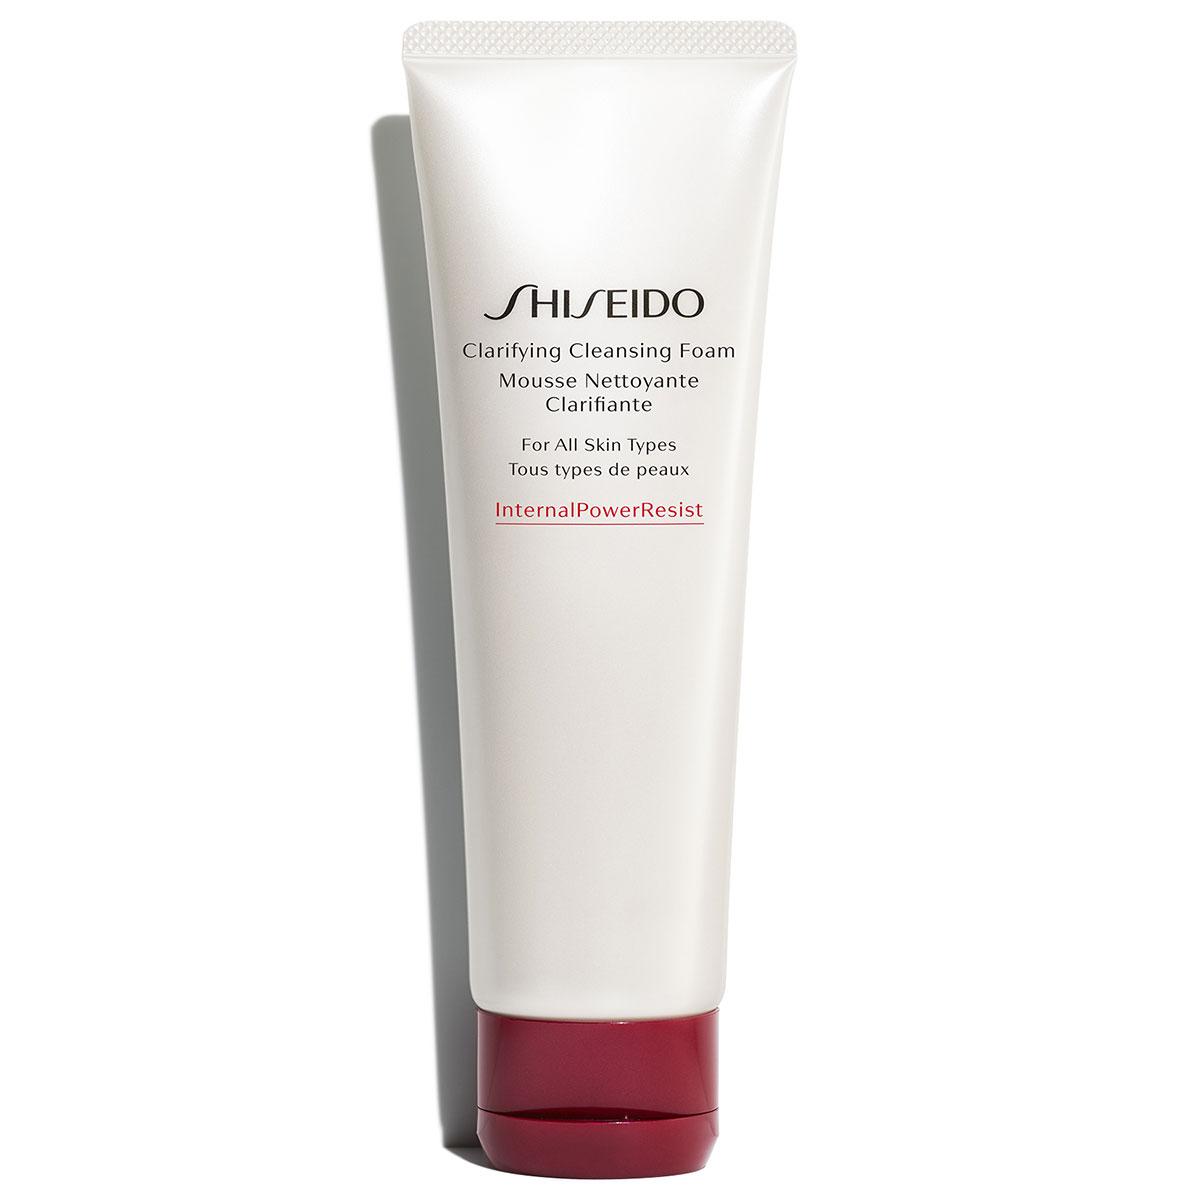 Shiseido - Mousse Nettoyante Clarifiante - 125 ml